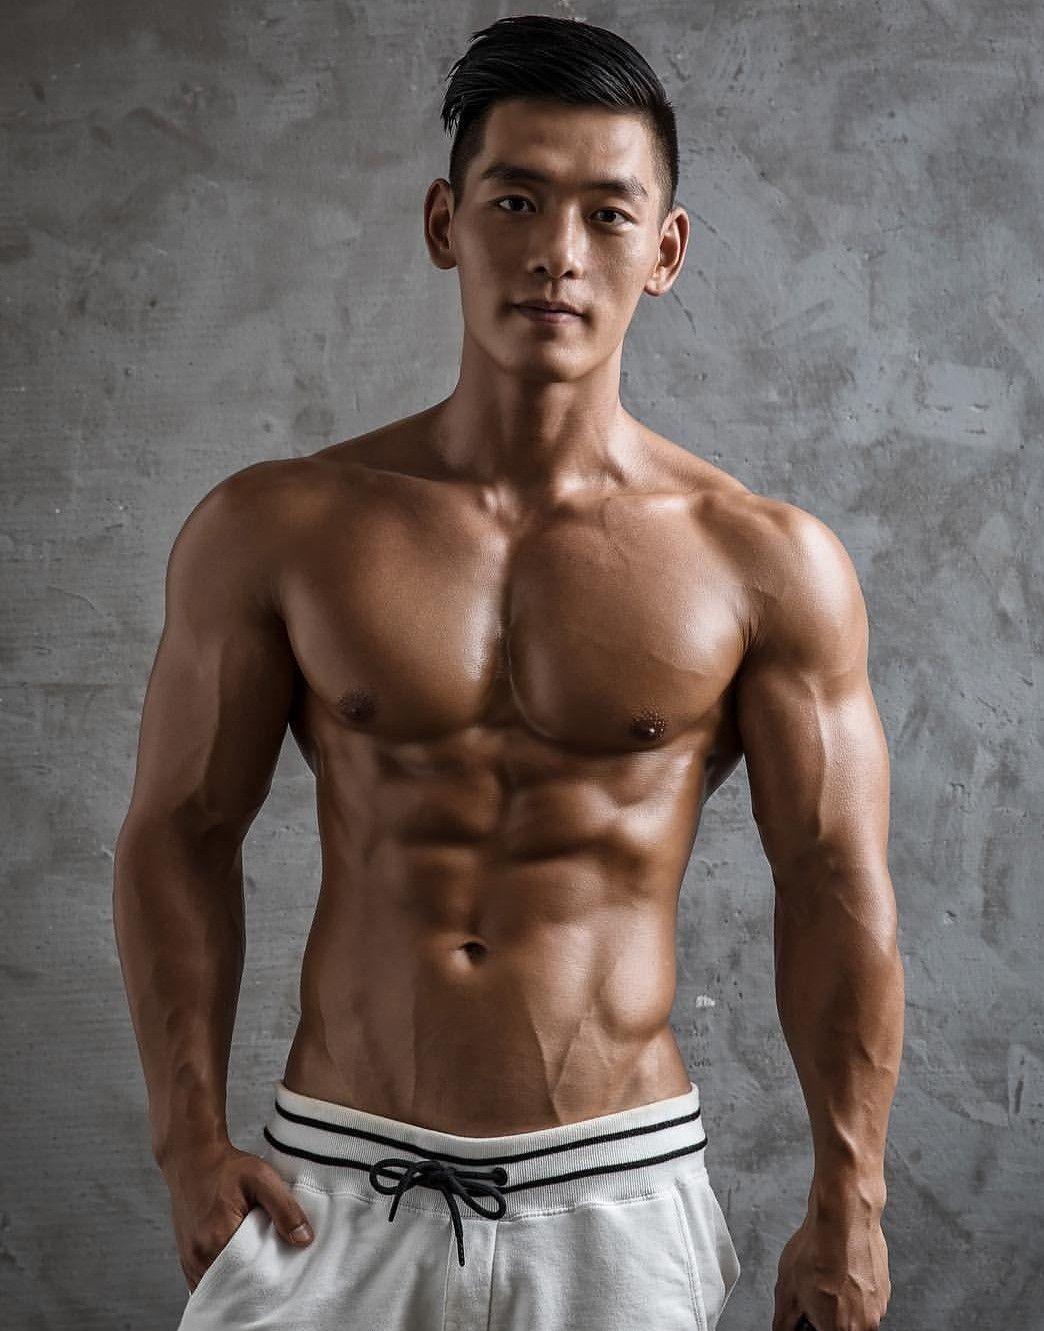 Pin by Rinnie on Boy | Asian men, Asian boys, Boys